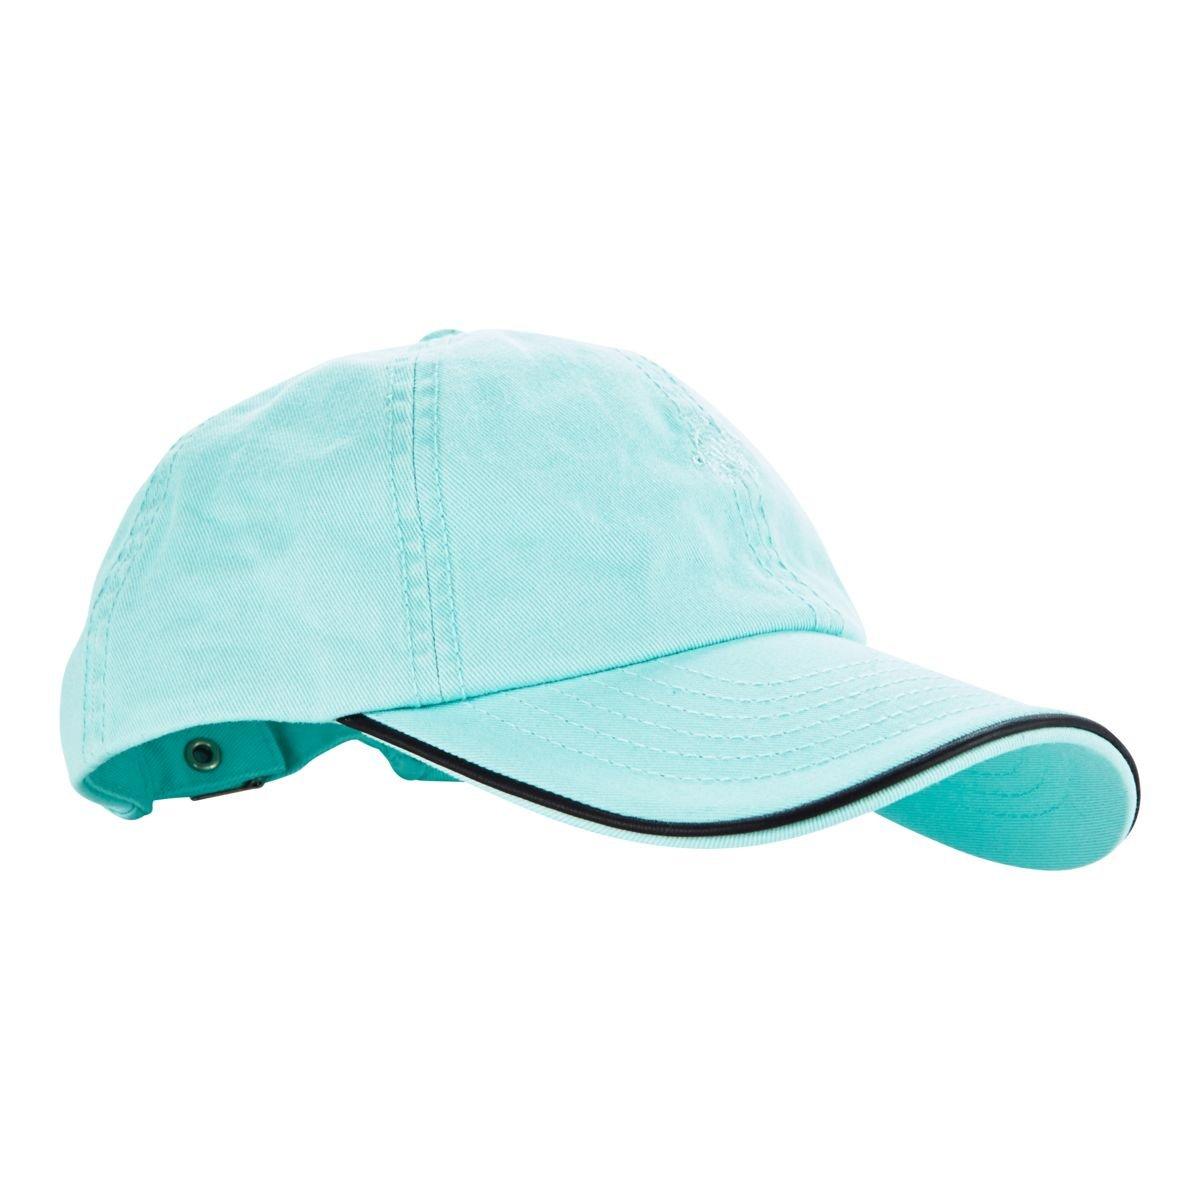 Vilebrequin - Boys Cap Solid - Lagoon - OSFA